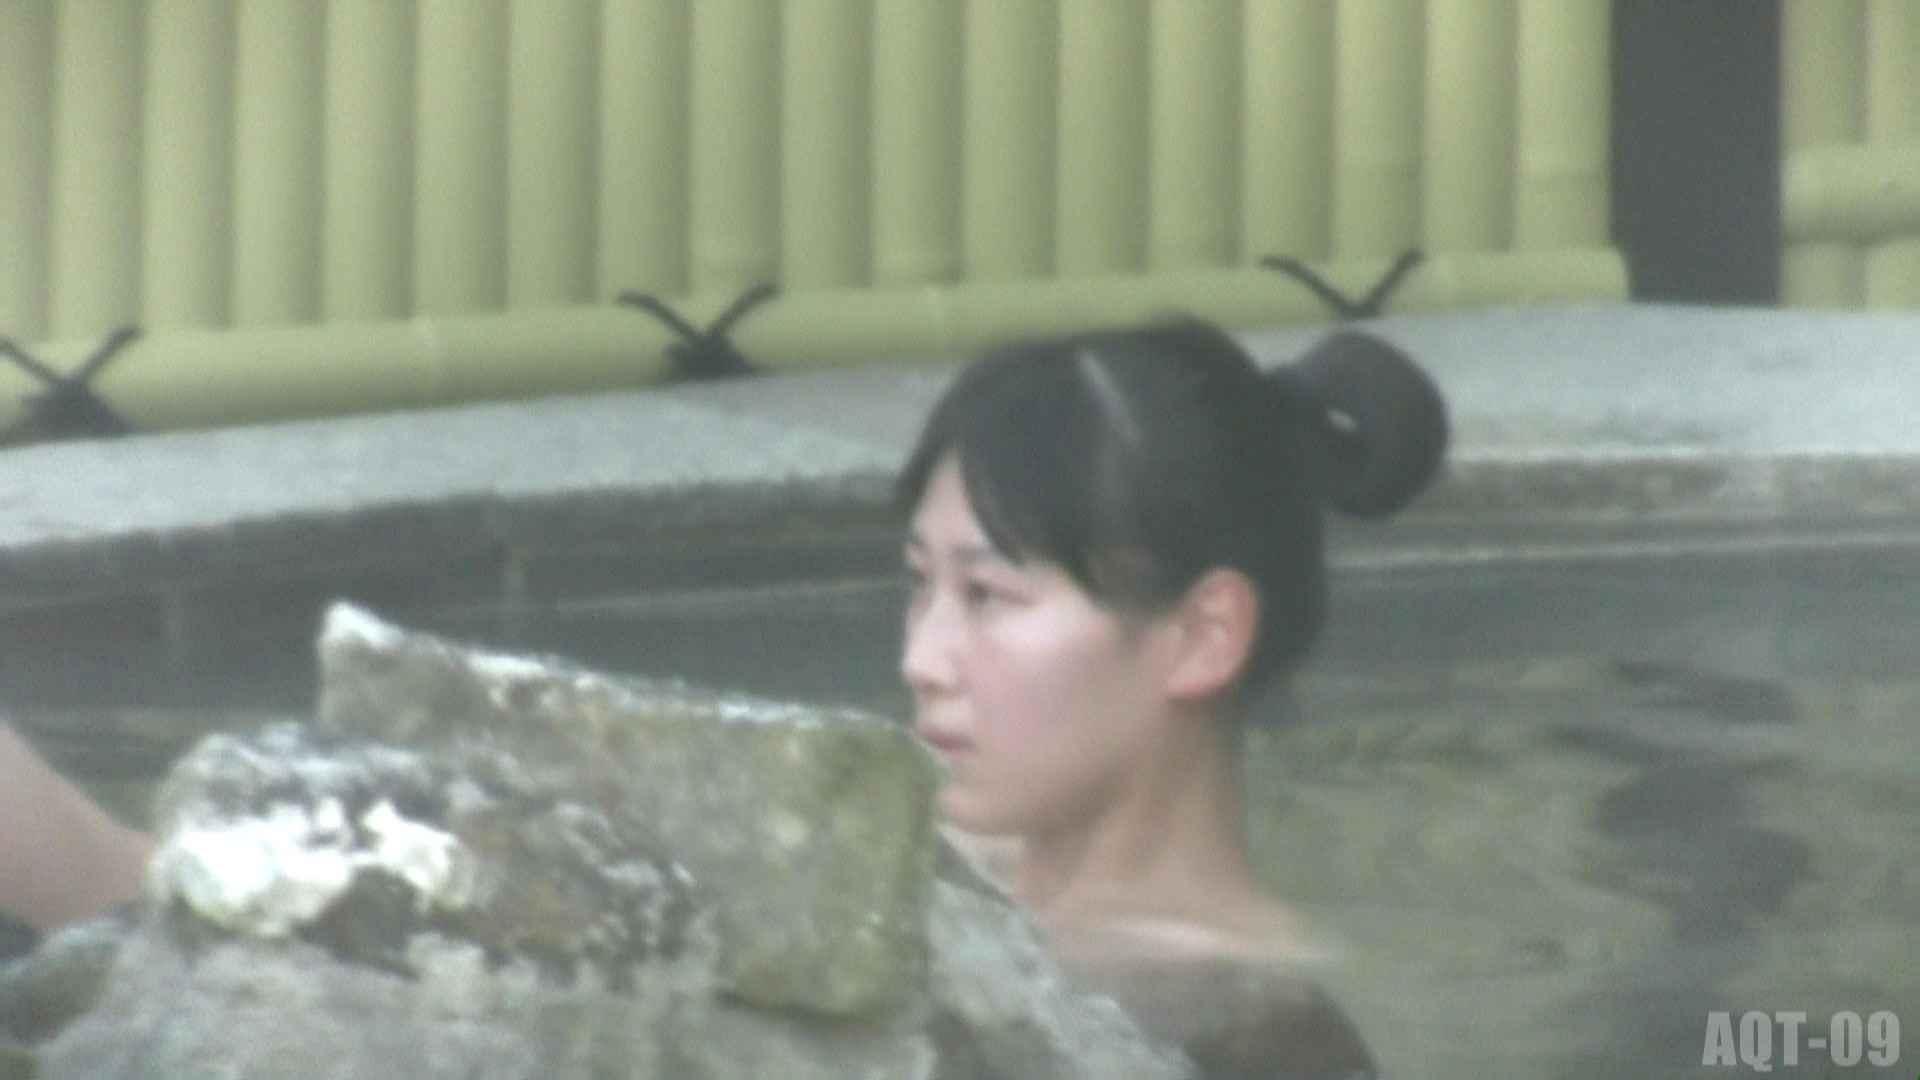 Aquaな露天風呂Vol.785 露天風呂編  110PIX 84